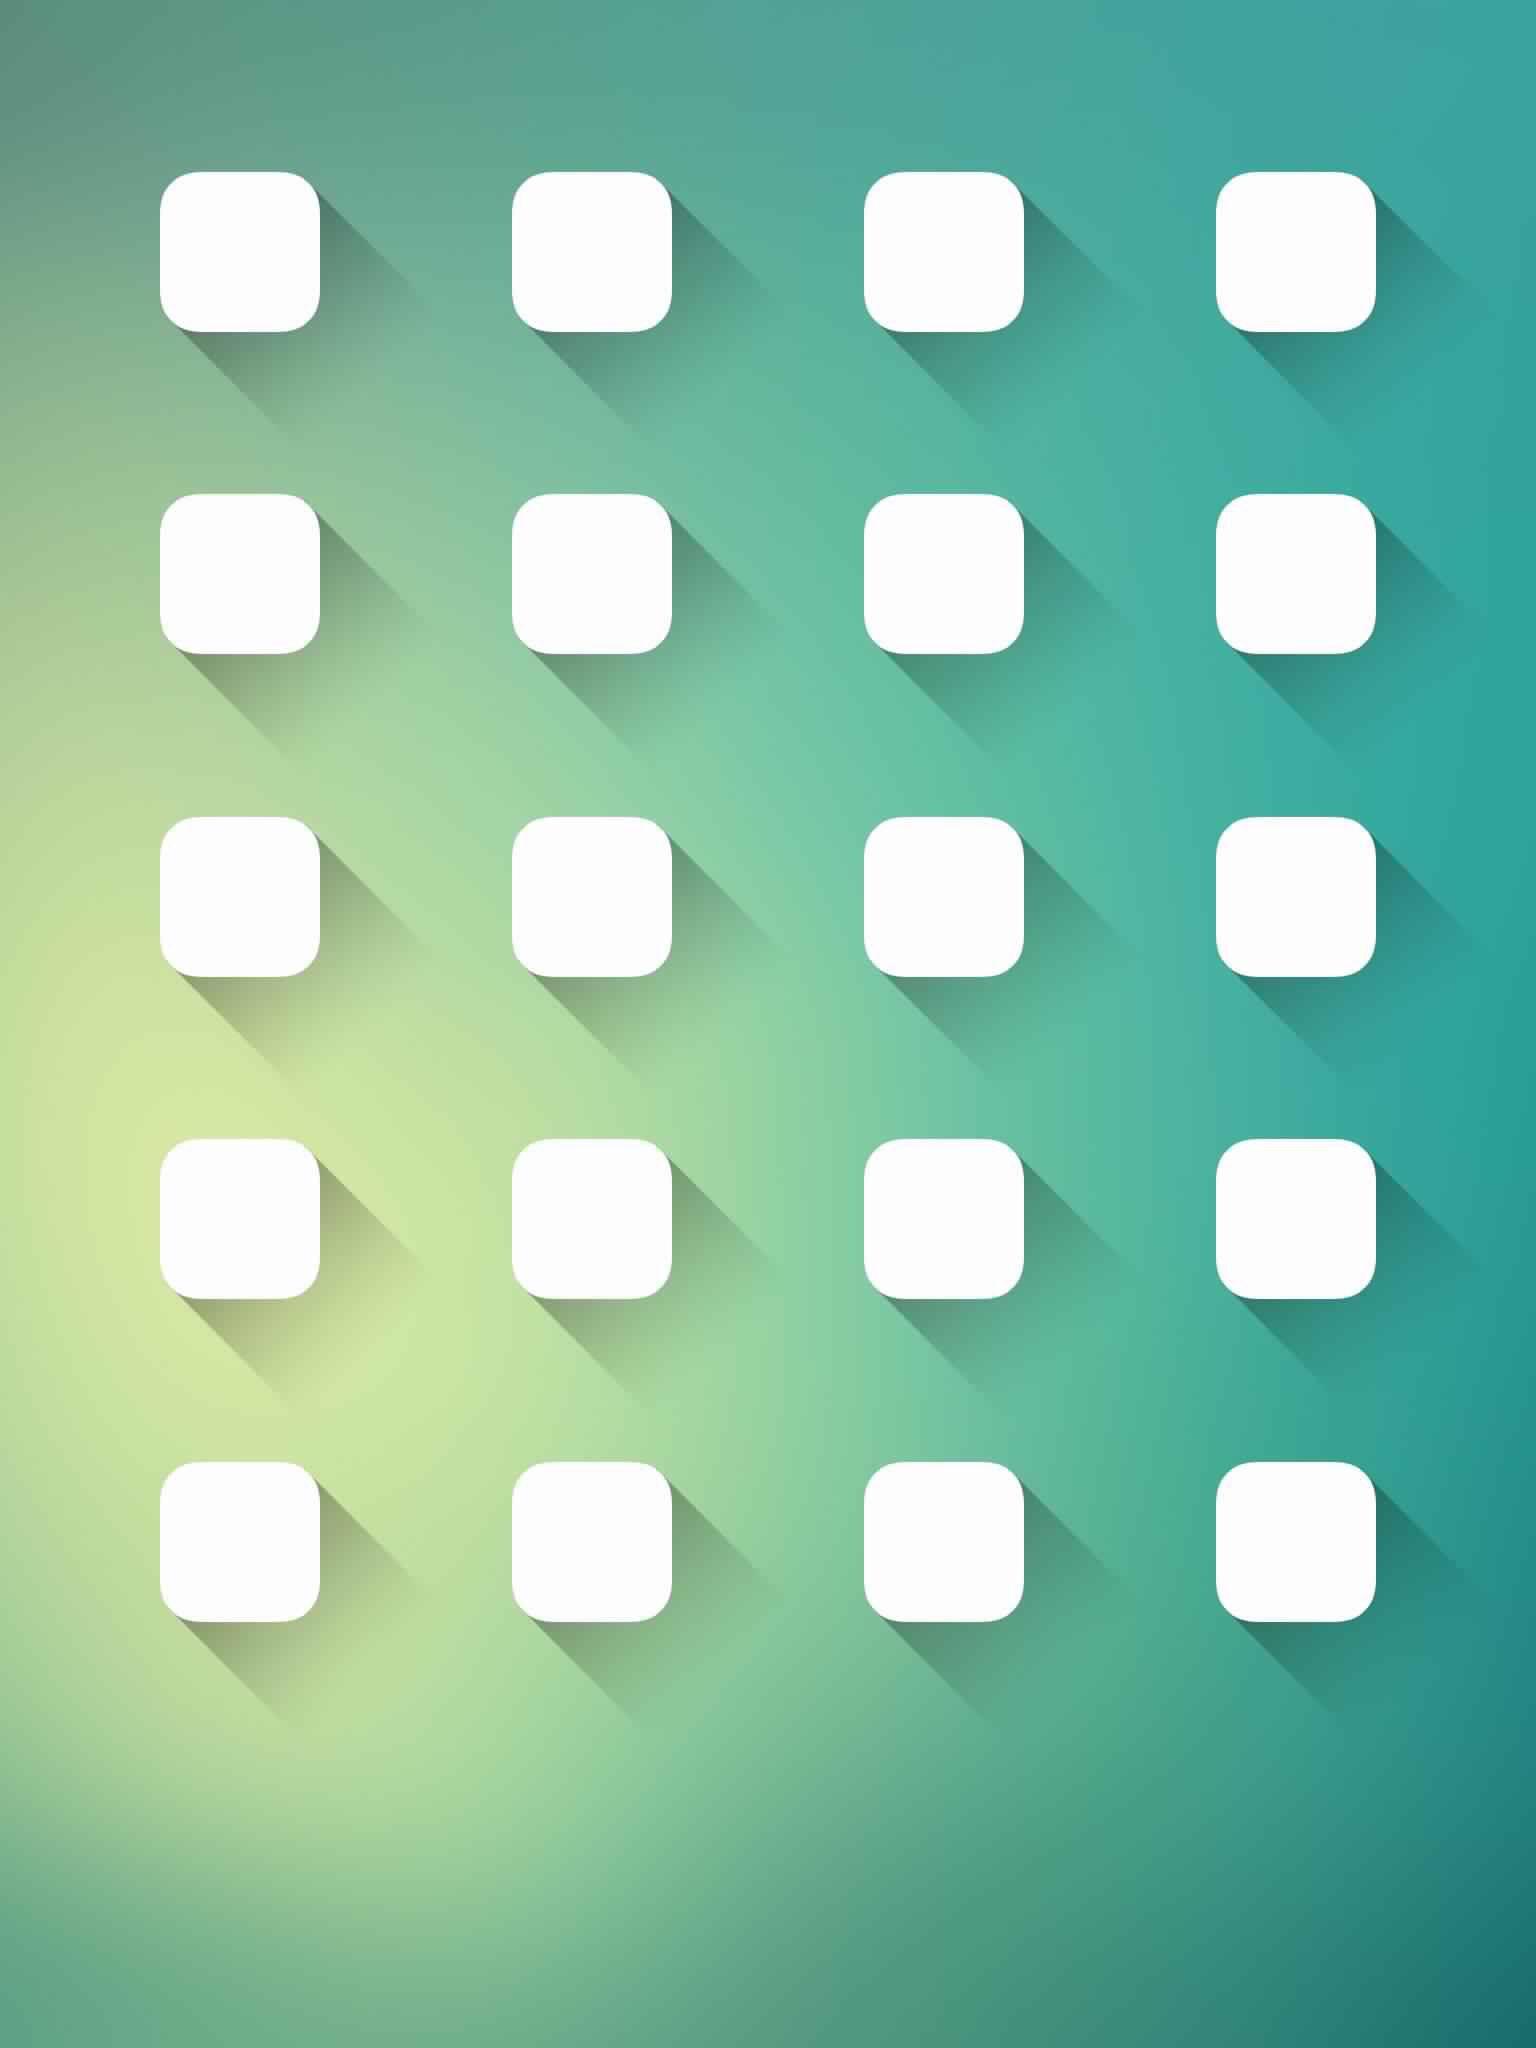 App Icon Skin Wallpaper